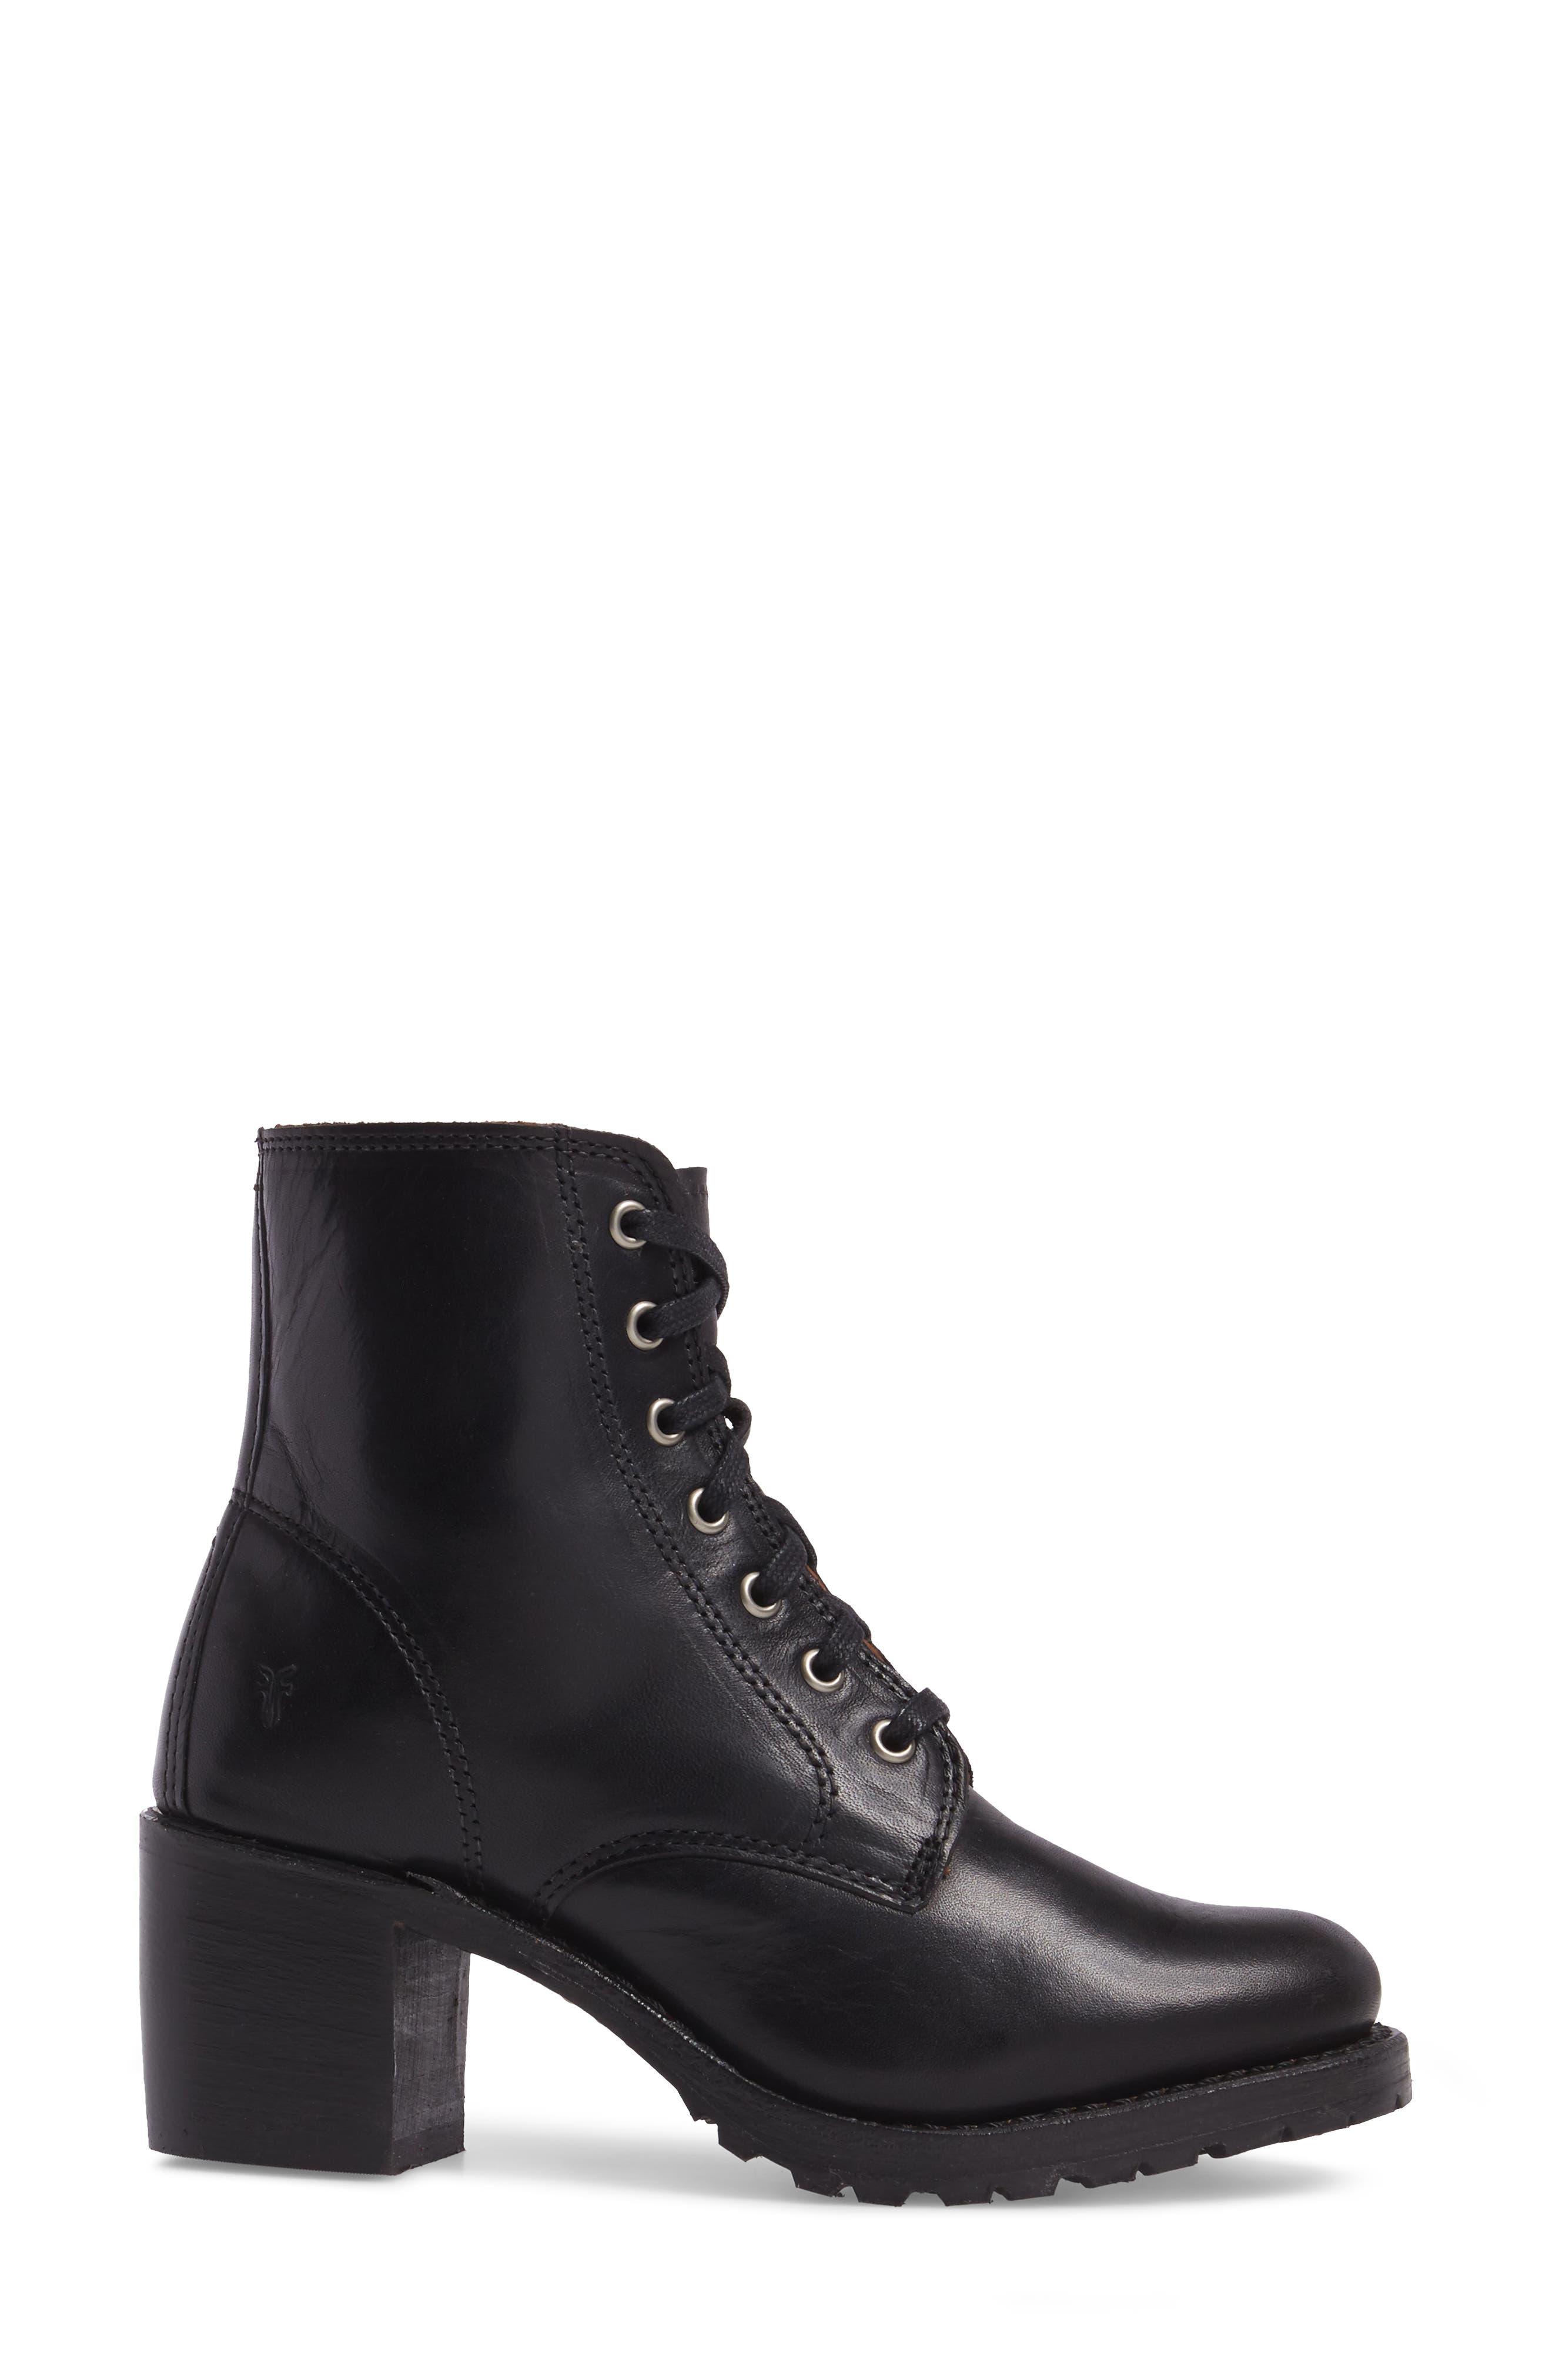 Sabrina 6G Lace-Up Boot,                             Alternate thumbnail 3, color,                             BLACK